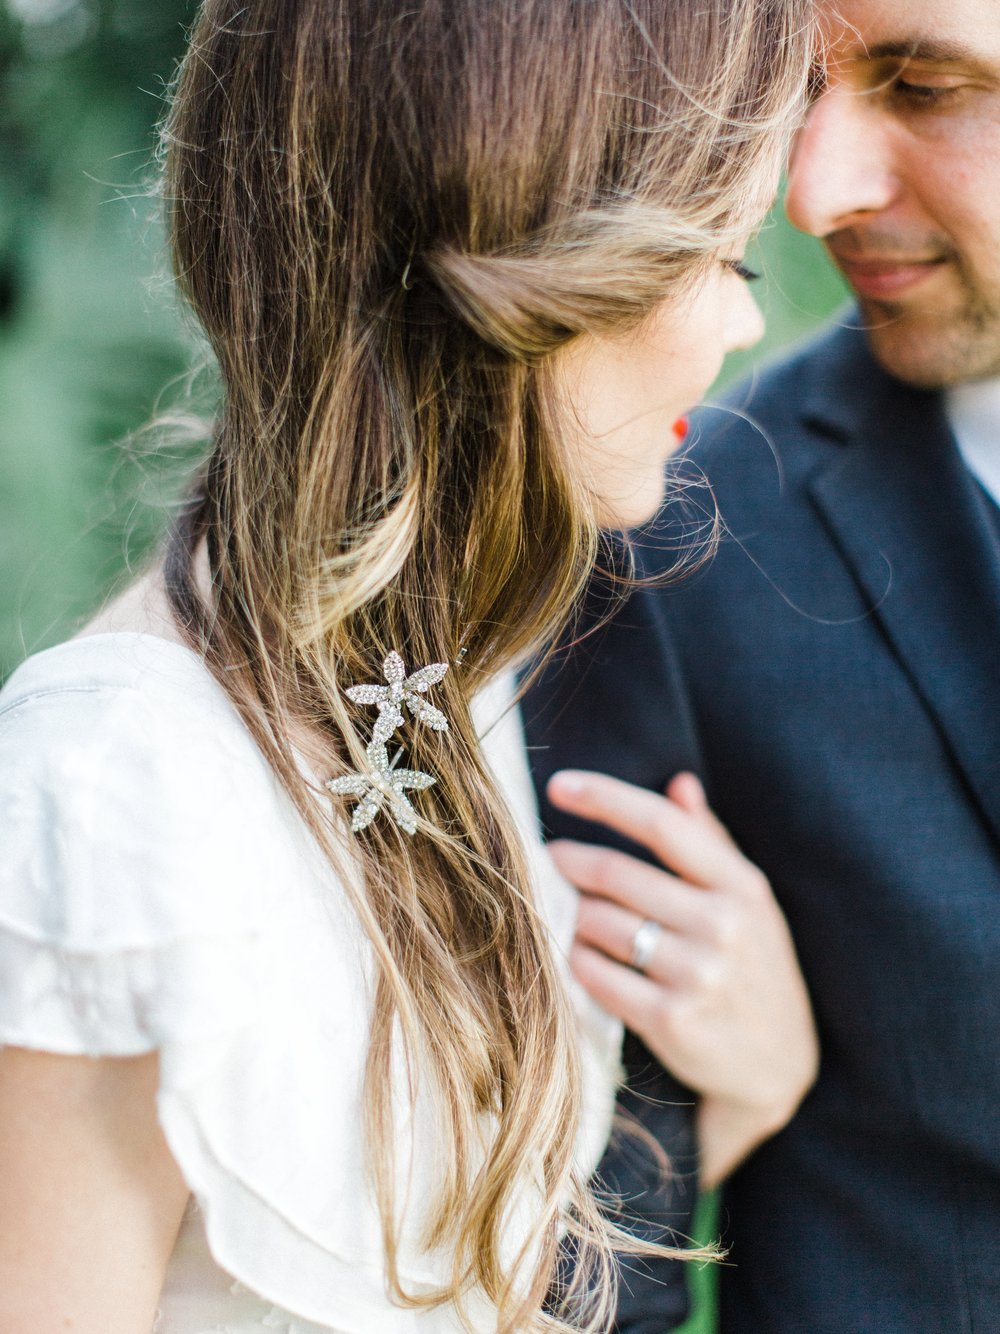 Anna-Delores-Photography-Santa-Barbara-Courthouse-Wedding-Elopement-Lisa-Brian-April-2017-9527.jpg